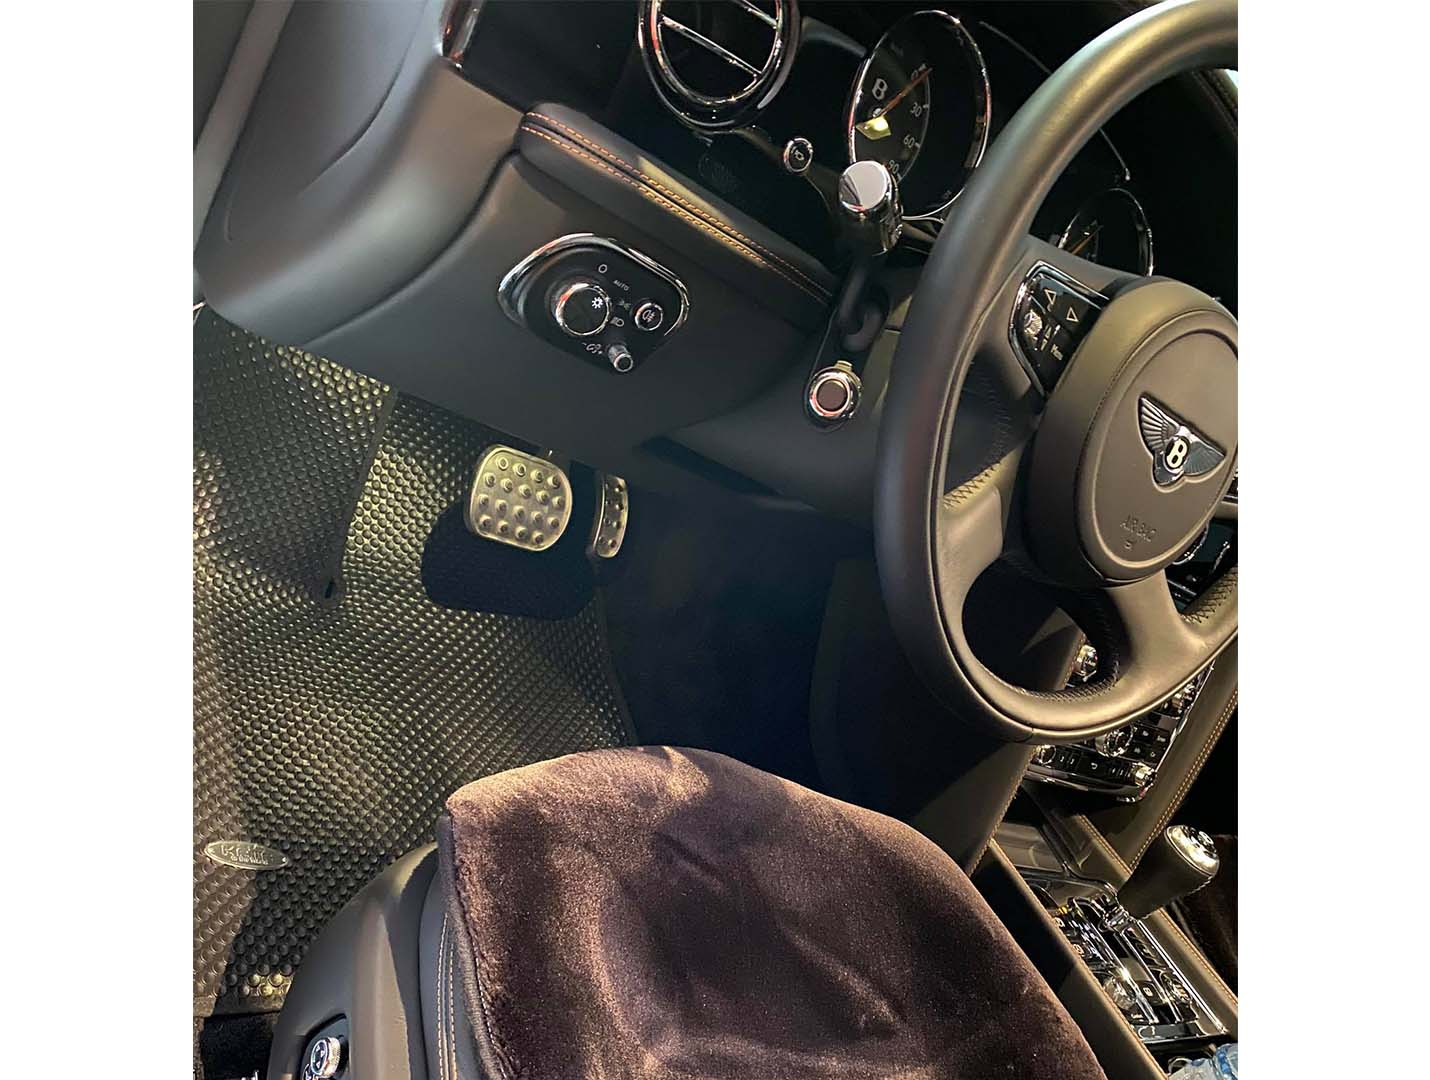 Thảm lót sàn Bentley Mulsanne